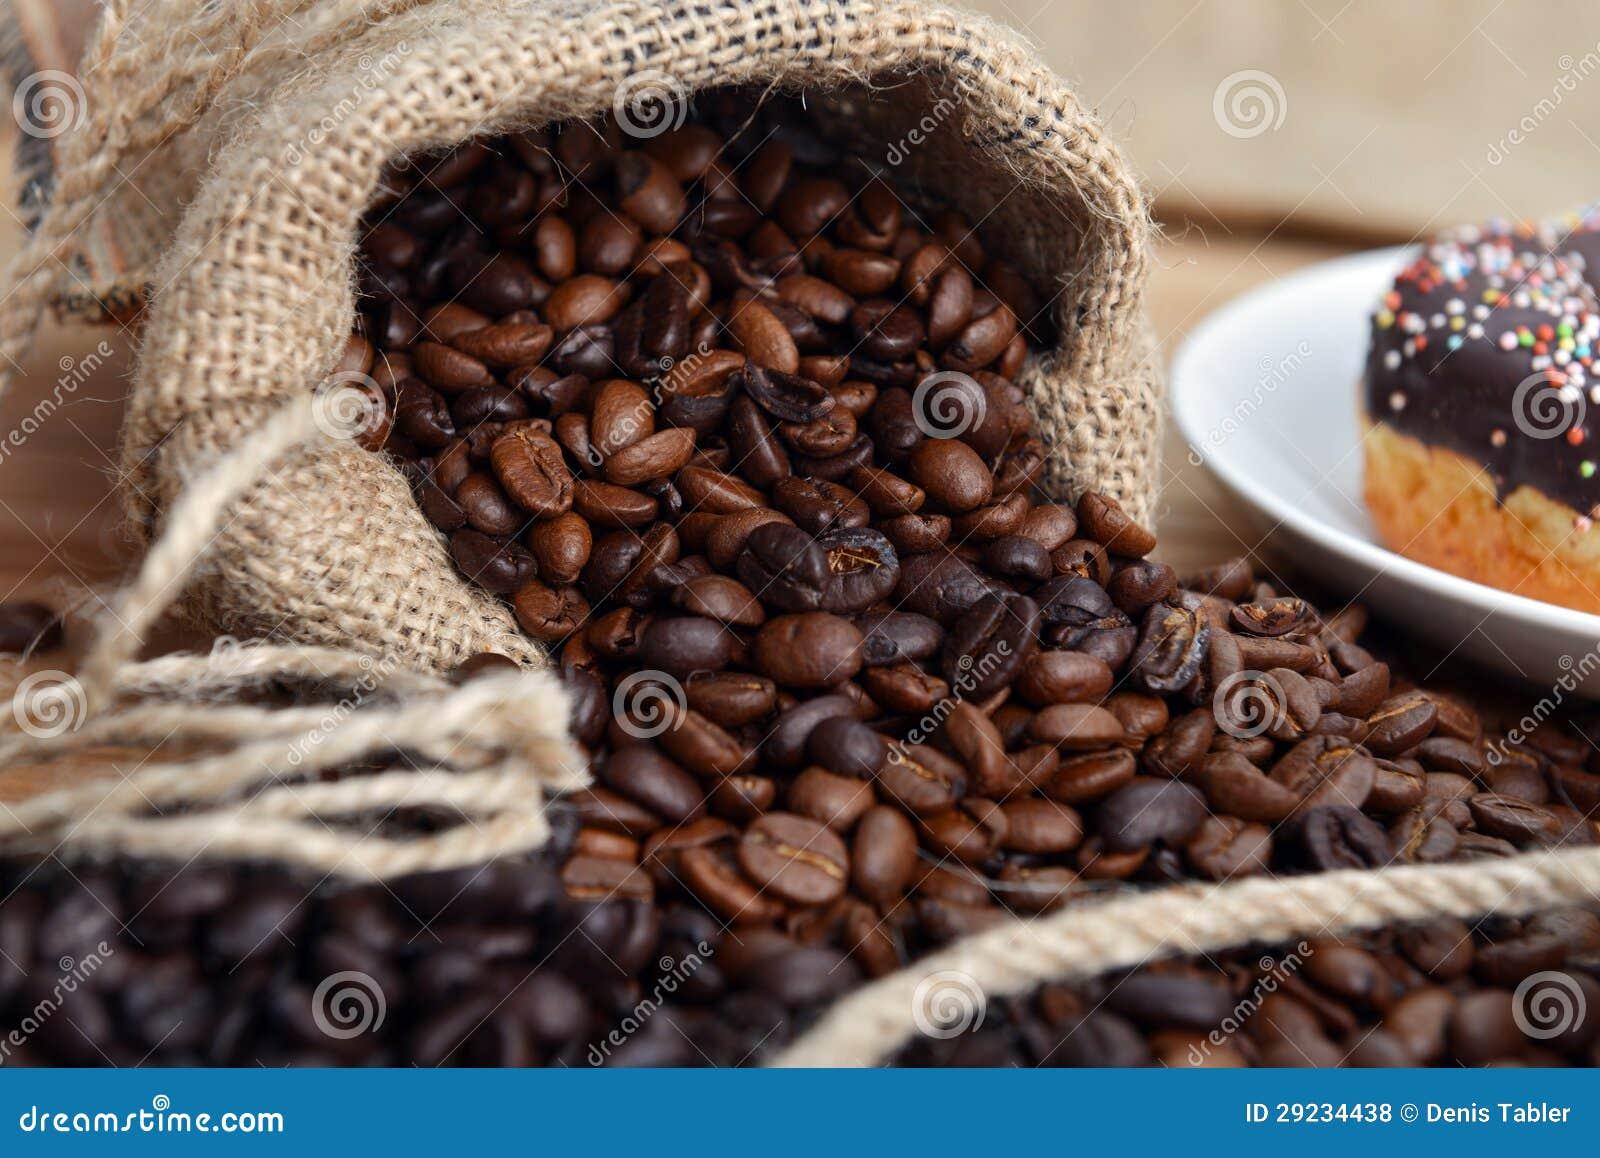 Download Feijões de café foto de stock. Imagem de hessian, grões - 29234438